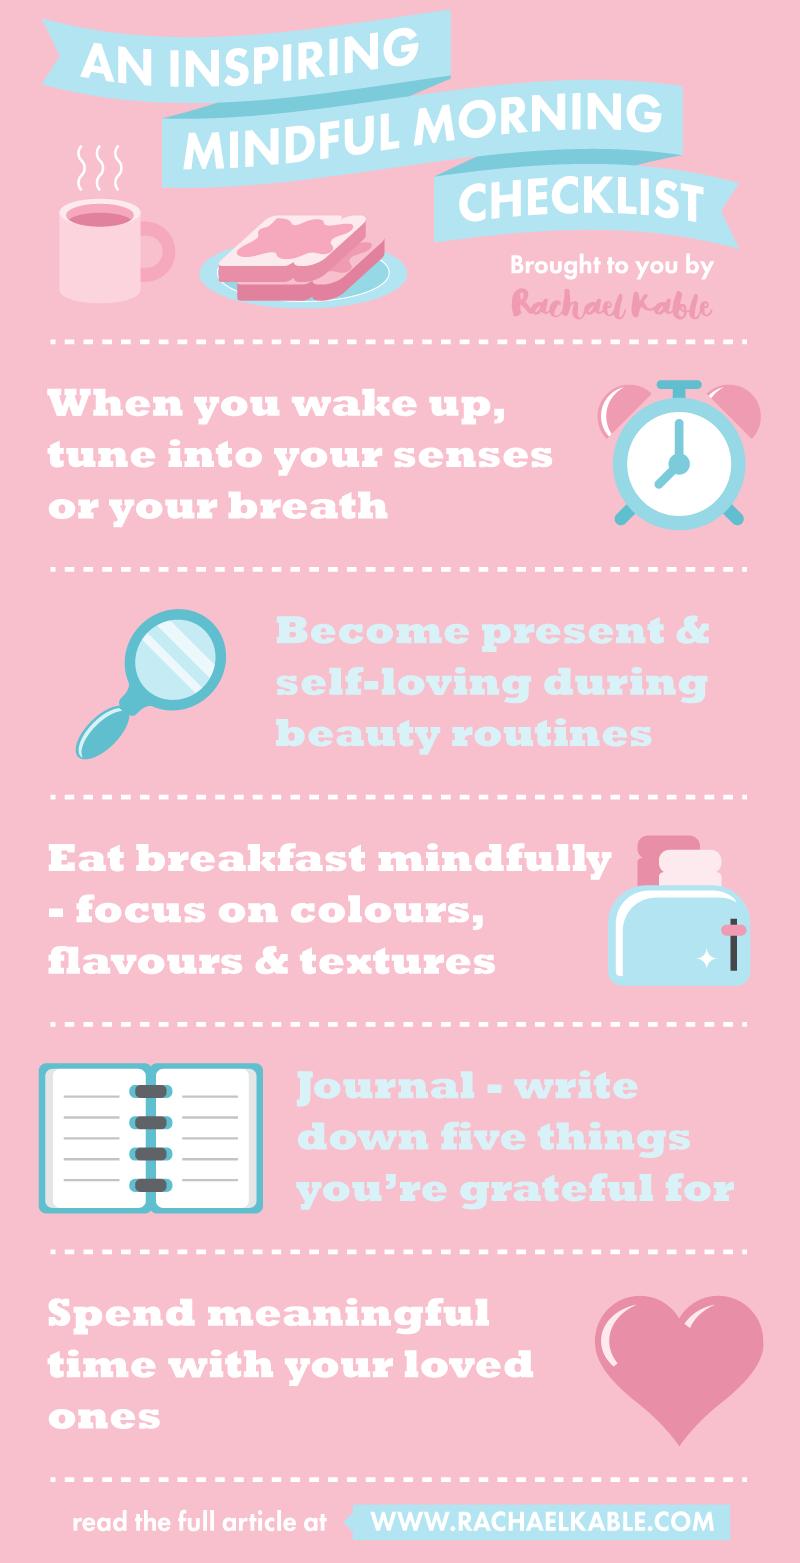 An Inspiring Mindful Morning Checklist